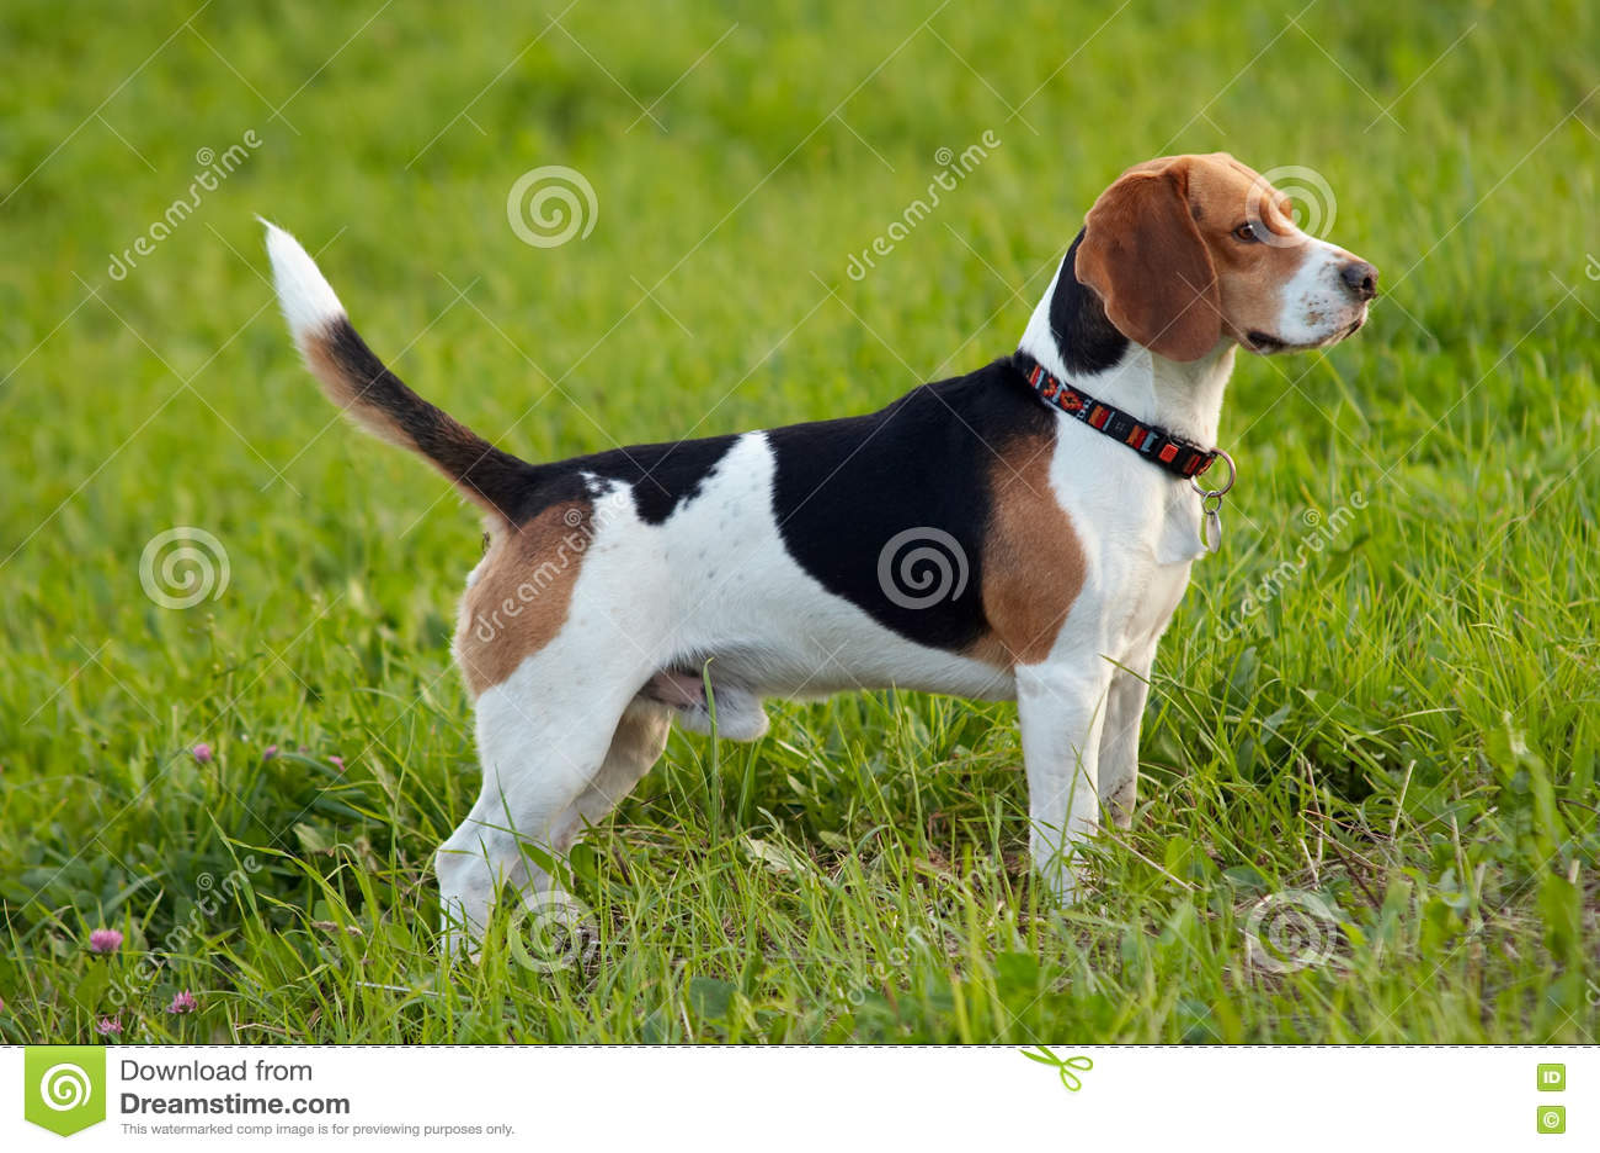 July Hound Dog Breed